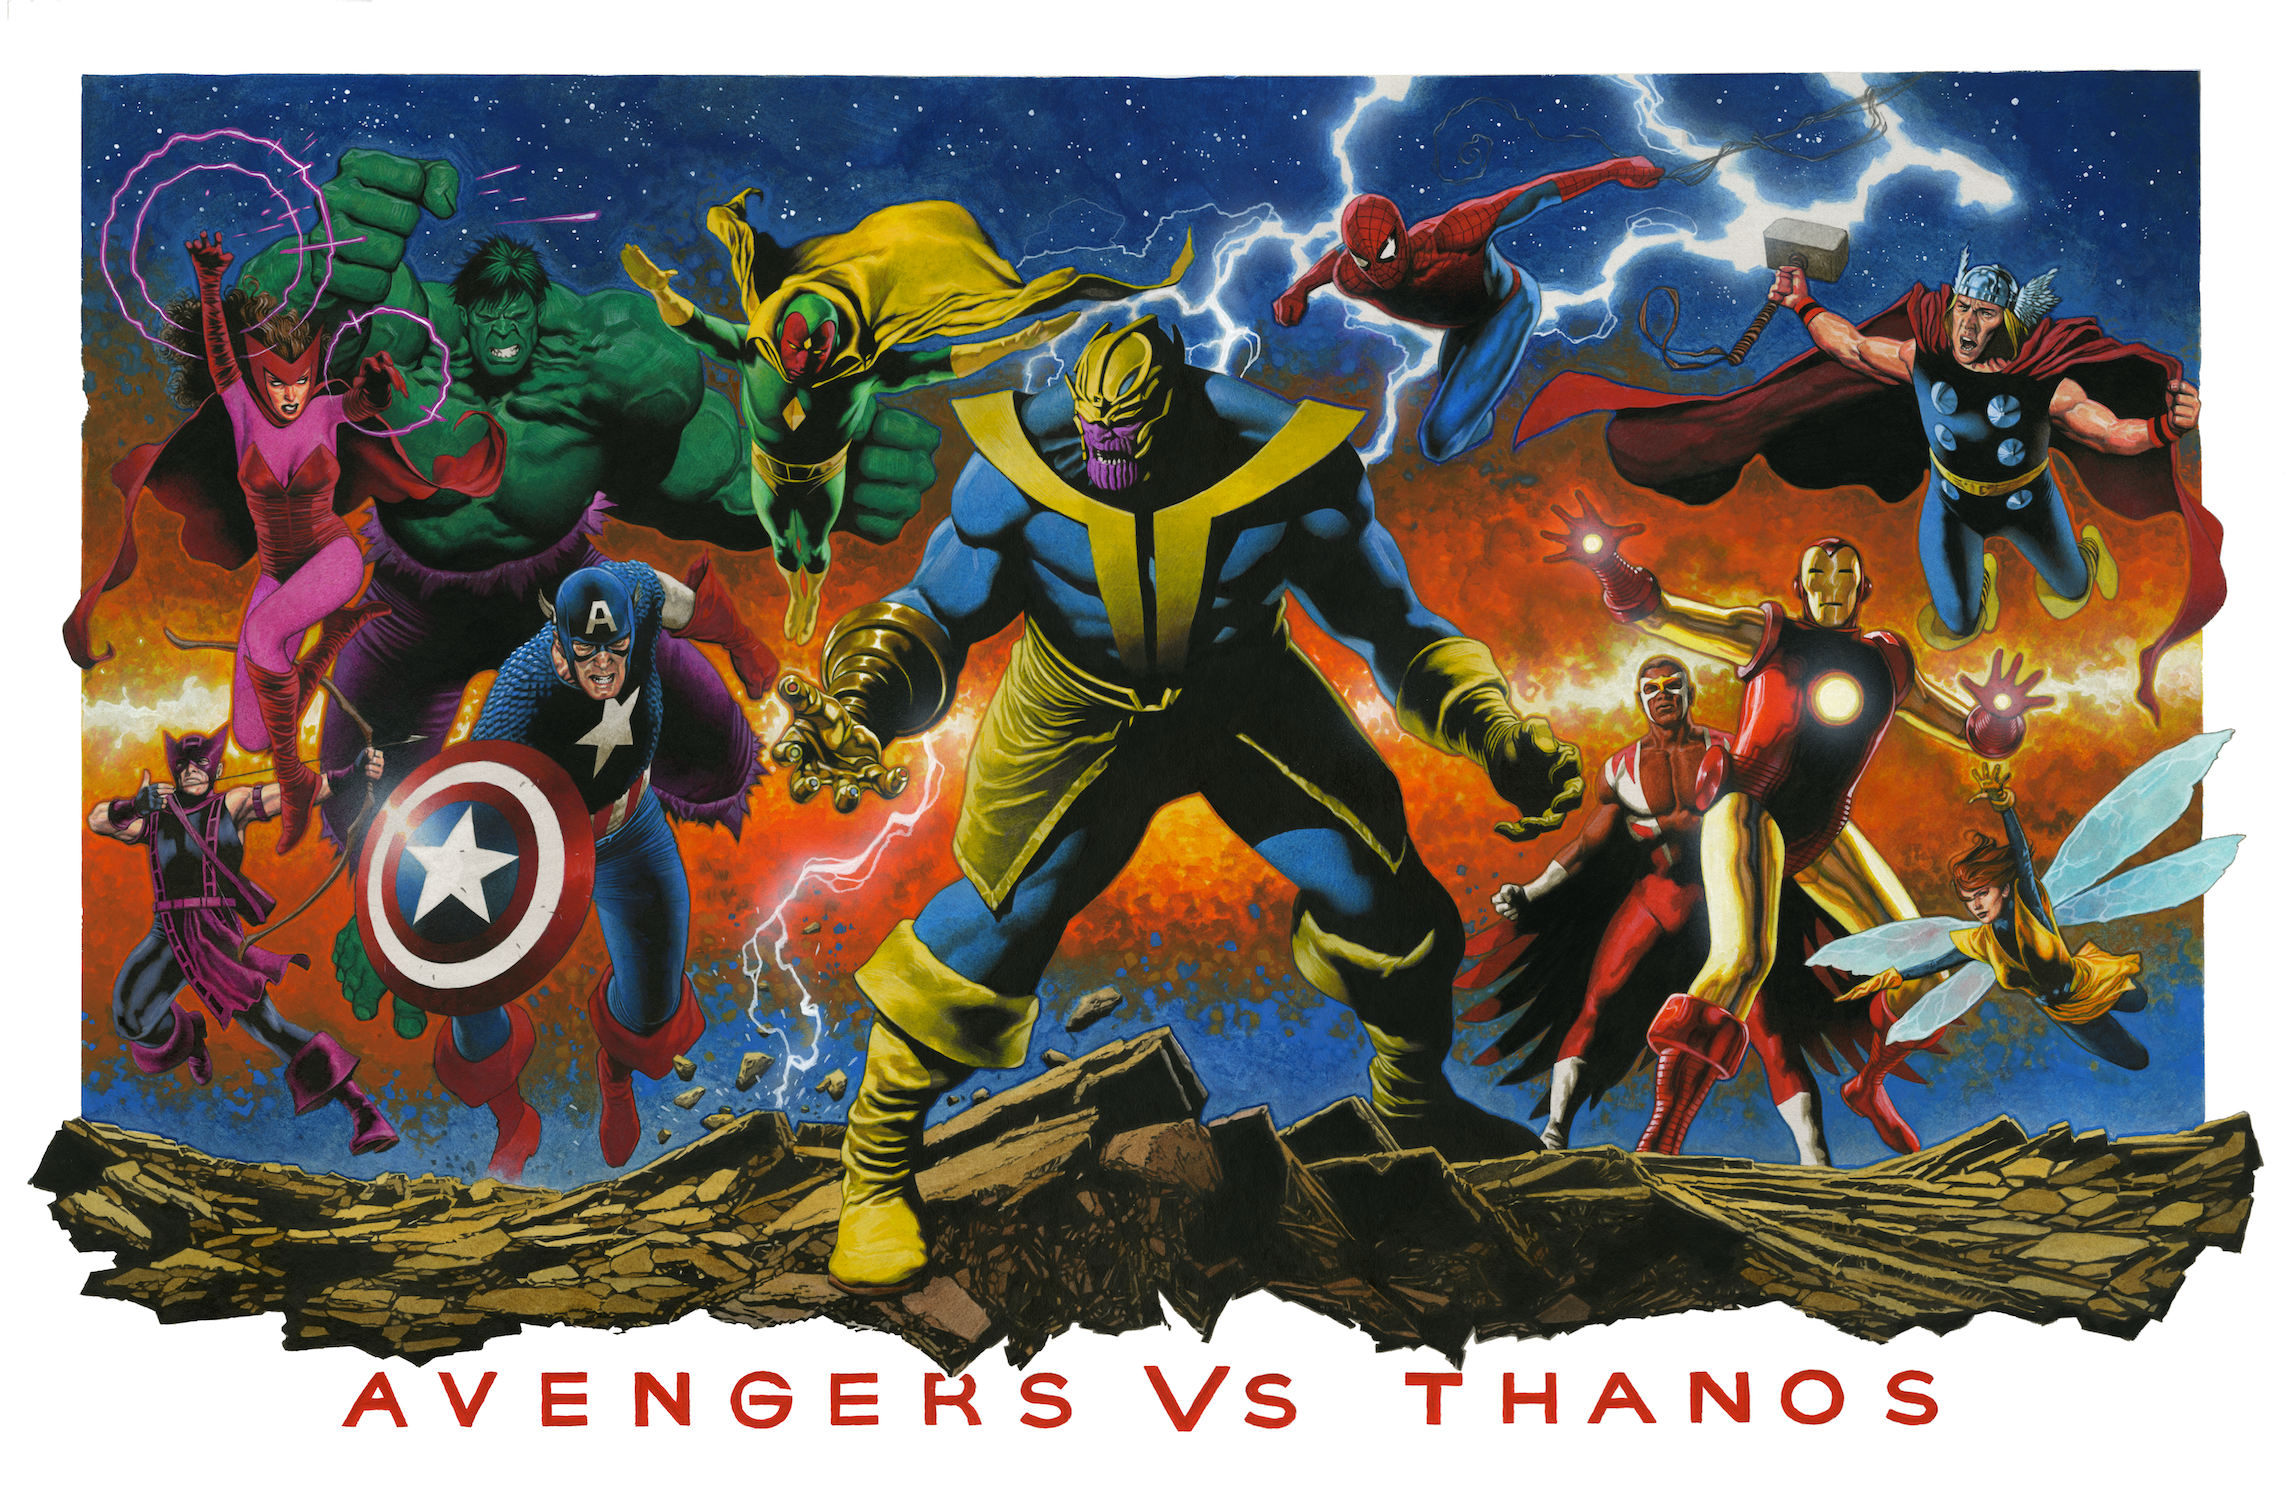 AvengersVsThanos.jpg